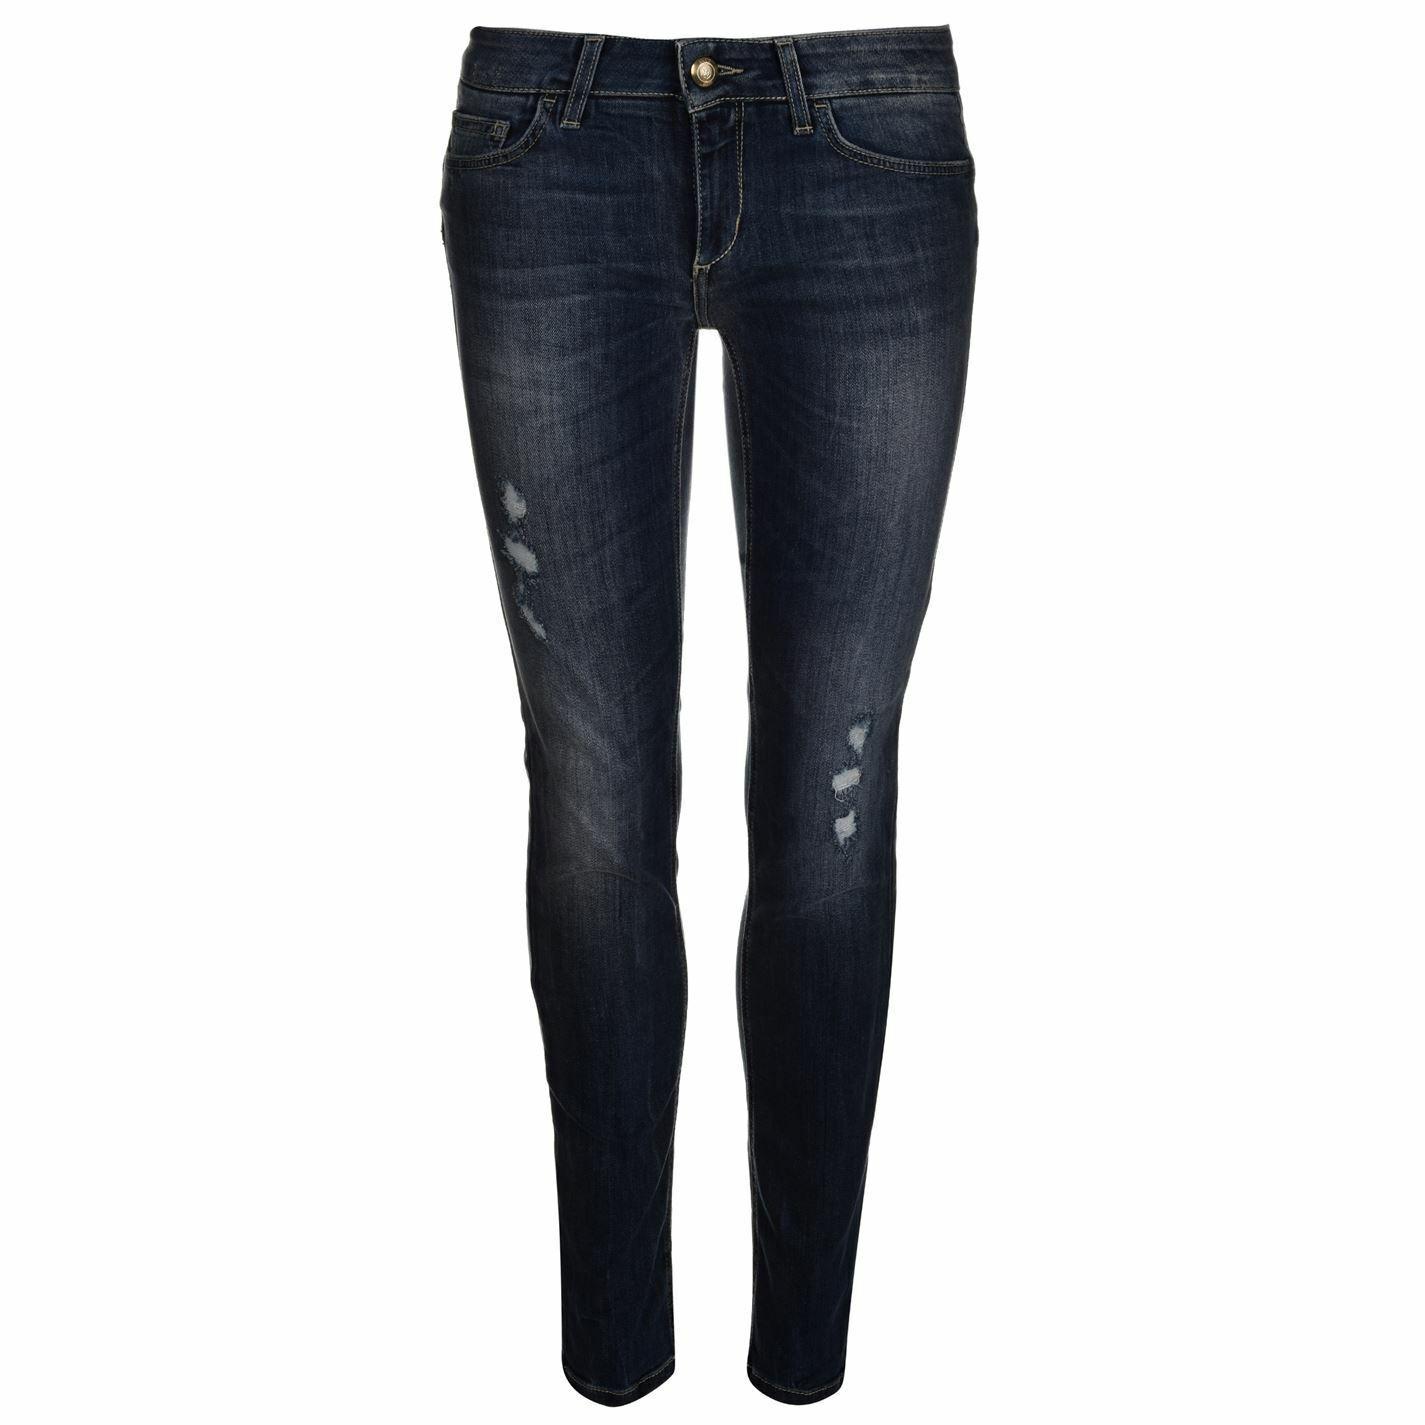 Liu Jo 406 Jeans Femme Denim Pantalon